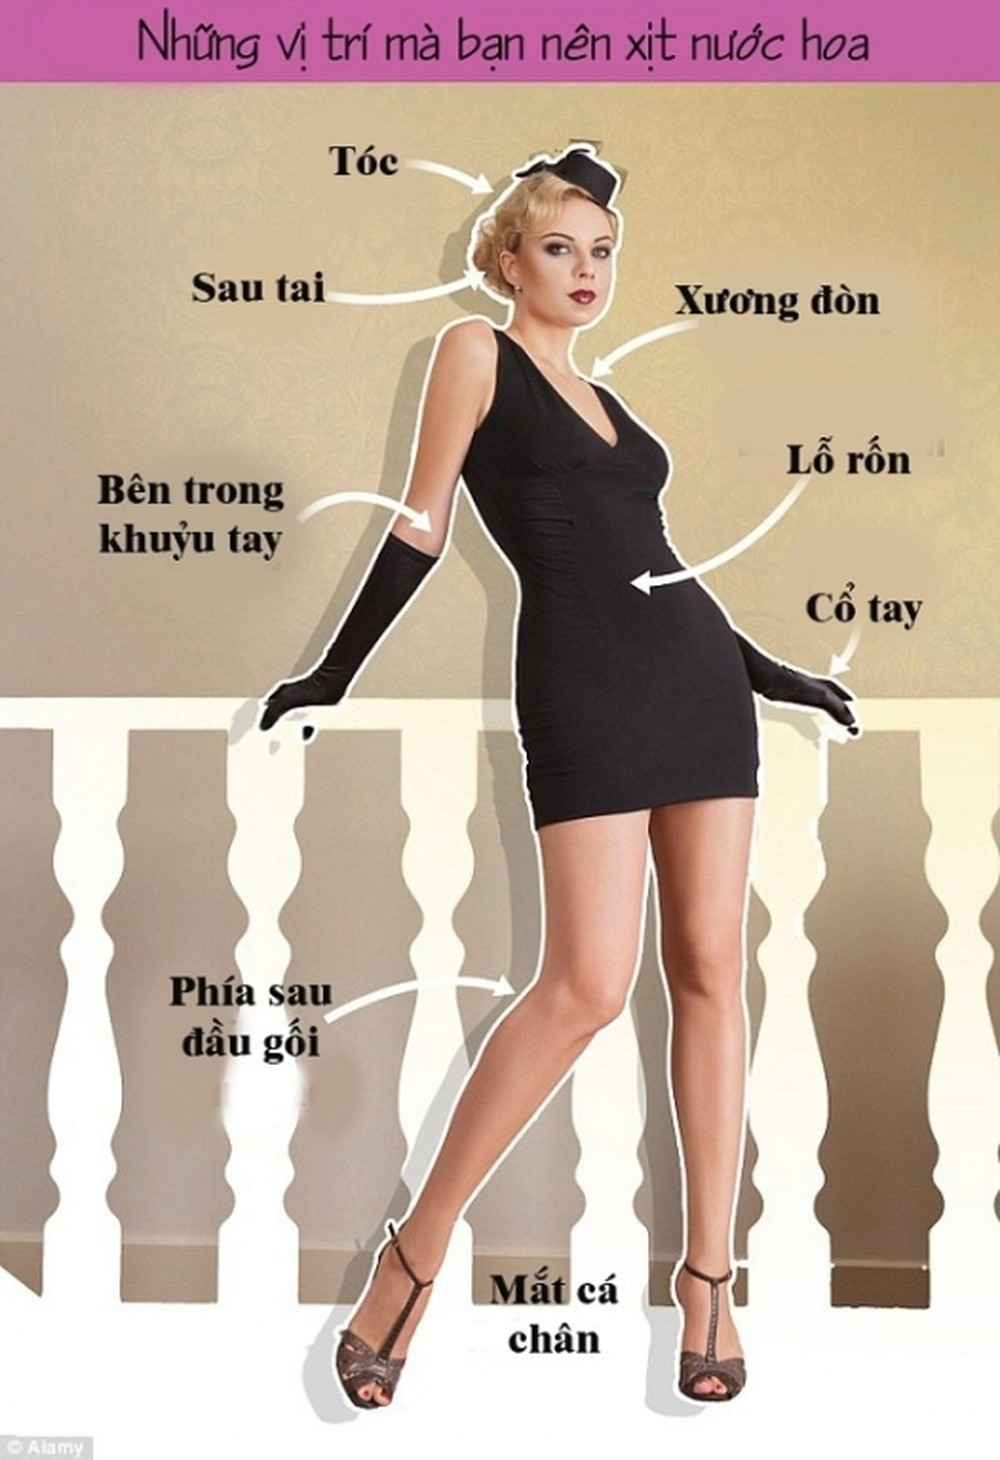 nhung-diem-xit-nuoc-hoa-tren-co-the